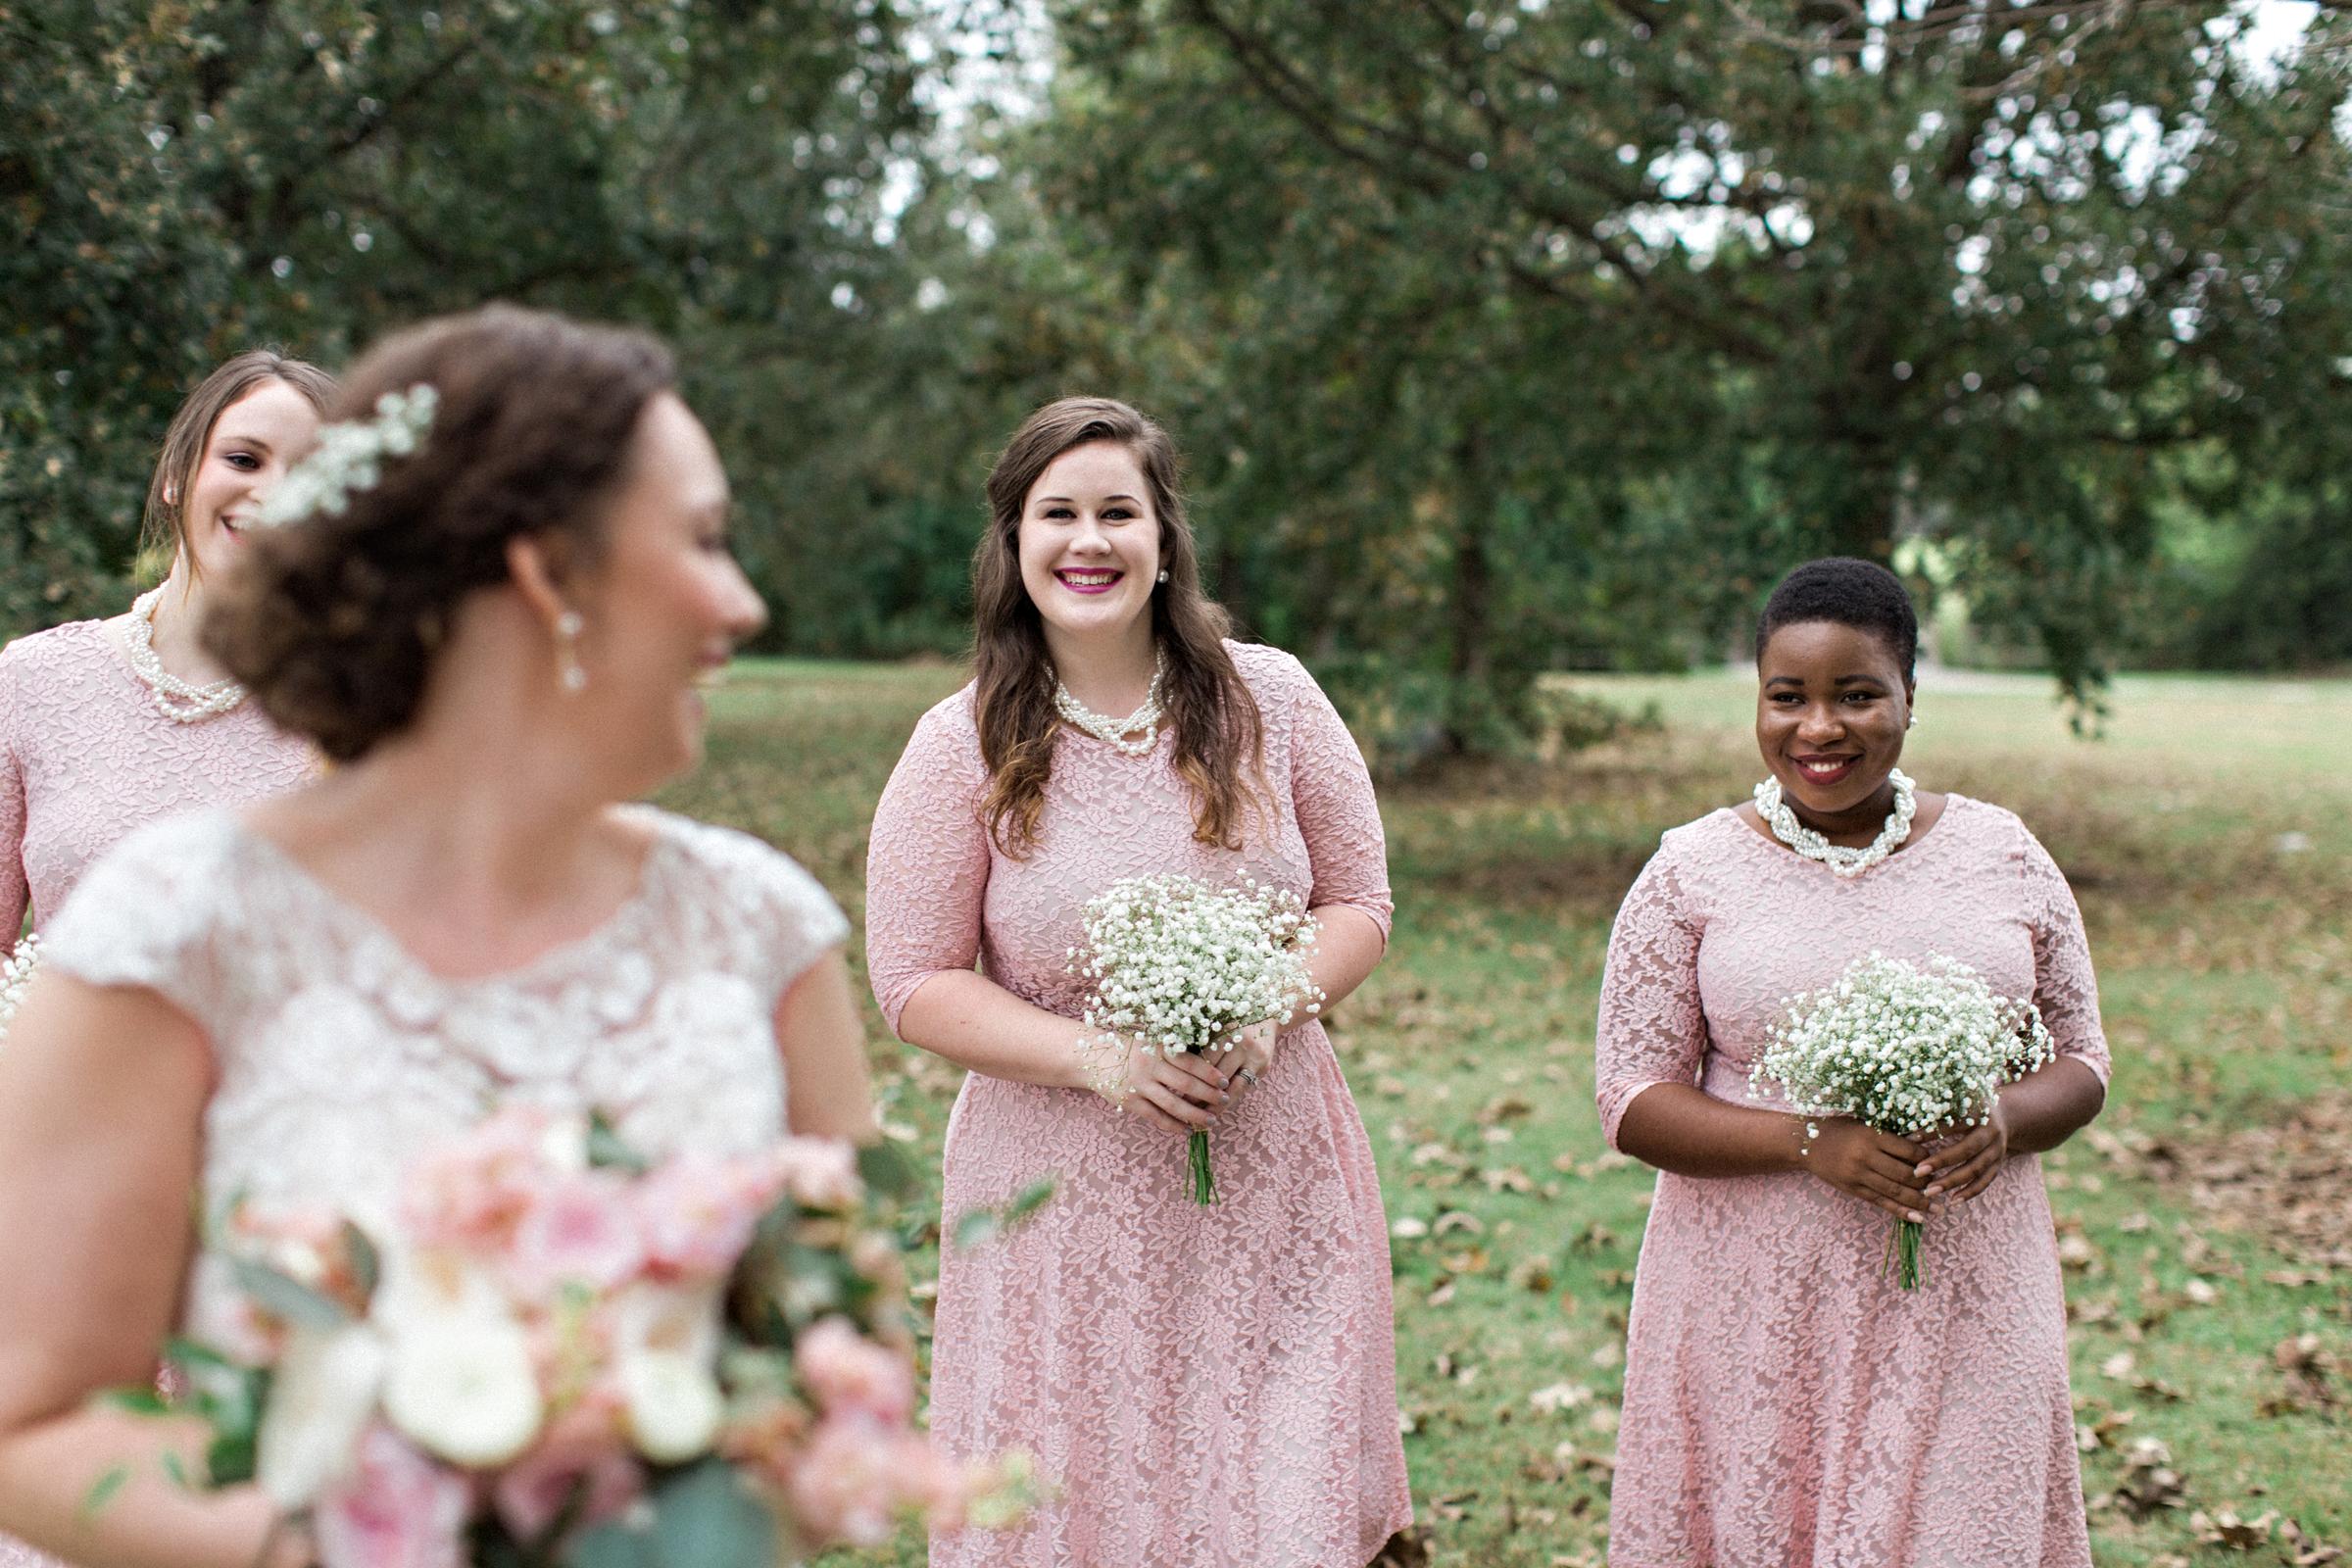 Alabama-Wedding-Photography-Nick-Drollette-Cory-Laura-115.jpg